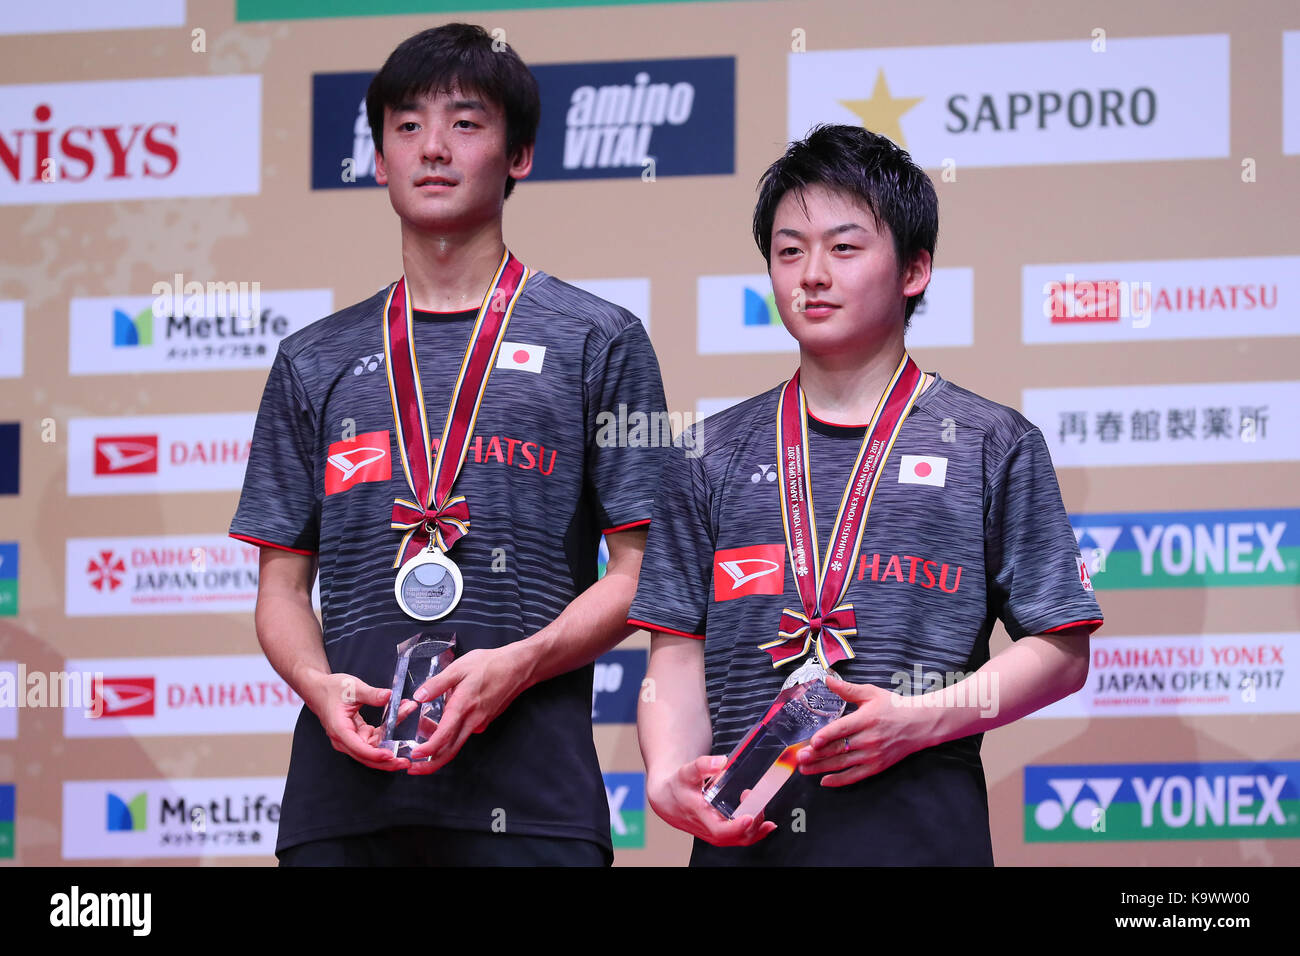 Tokyo Metropolitan Gymnasium Tokyo Japan 24th Sep 2017 Takuto